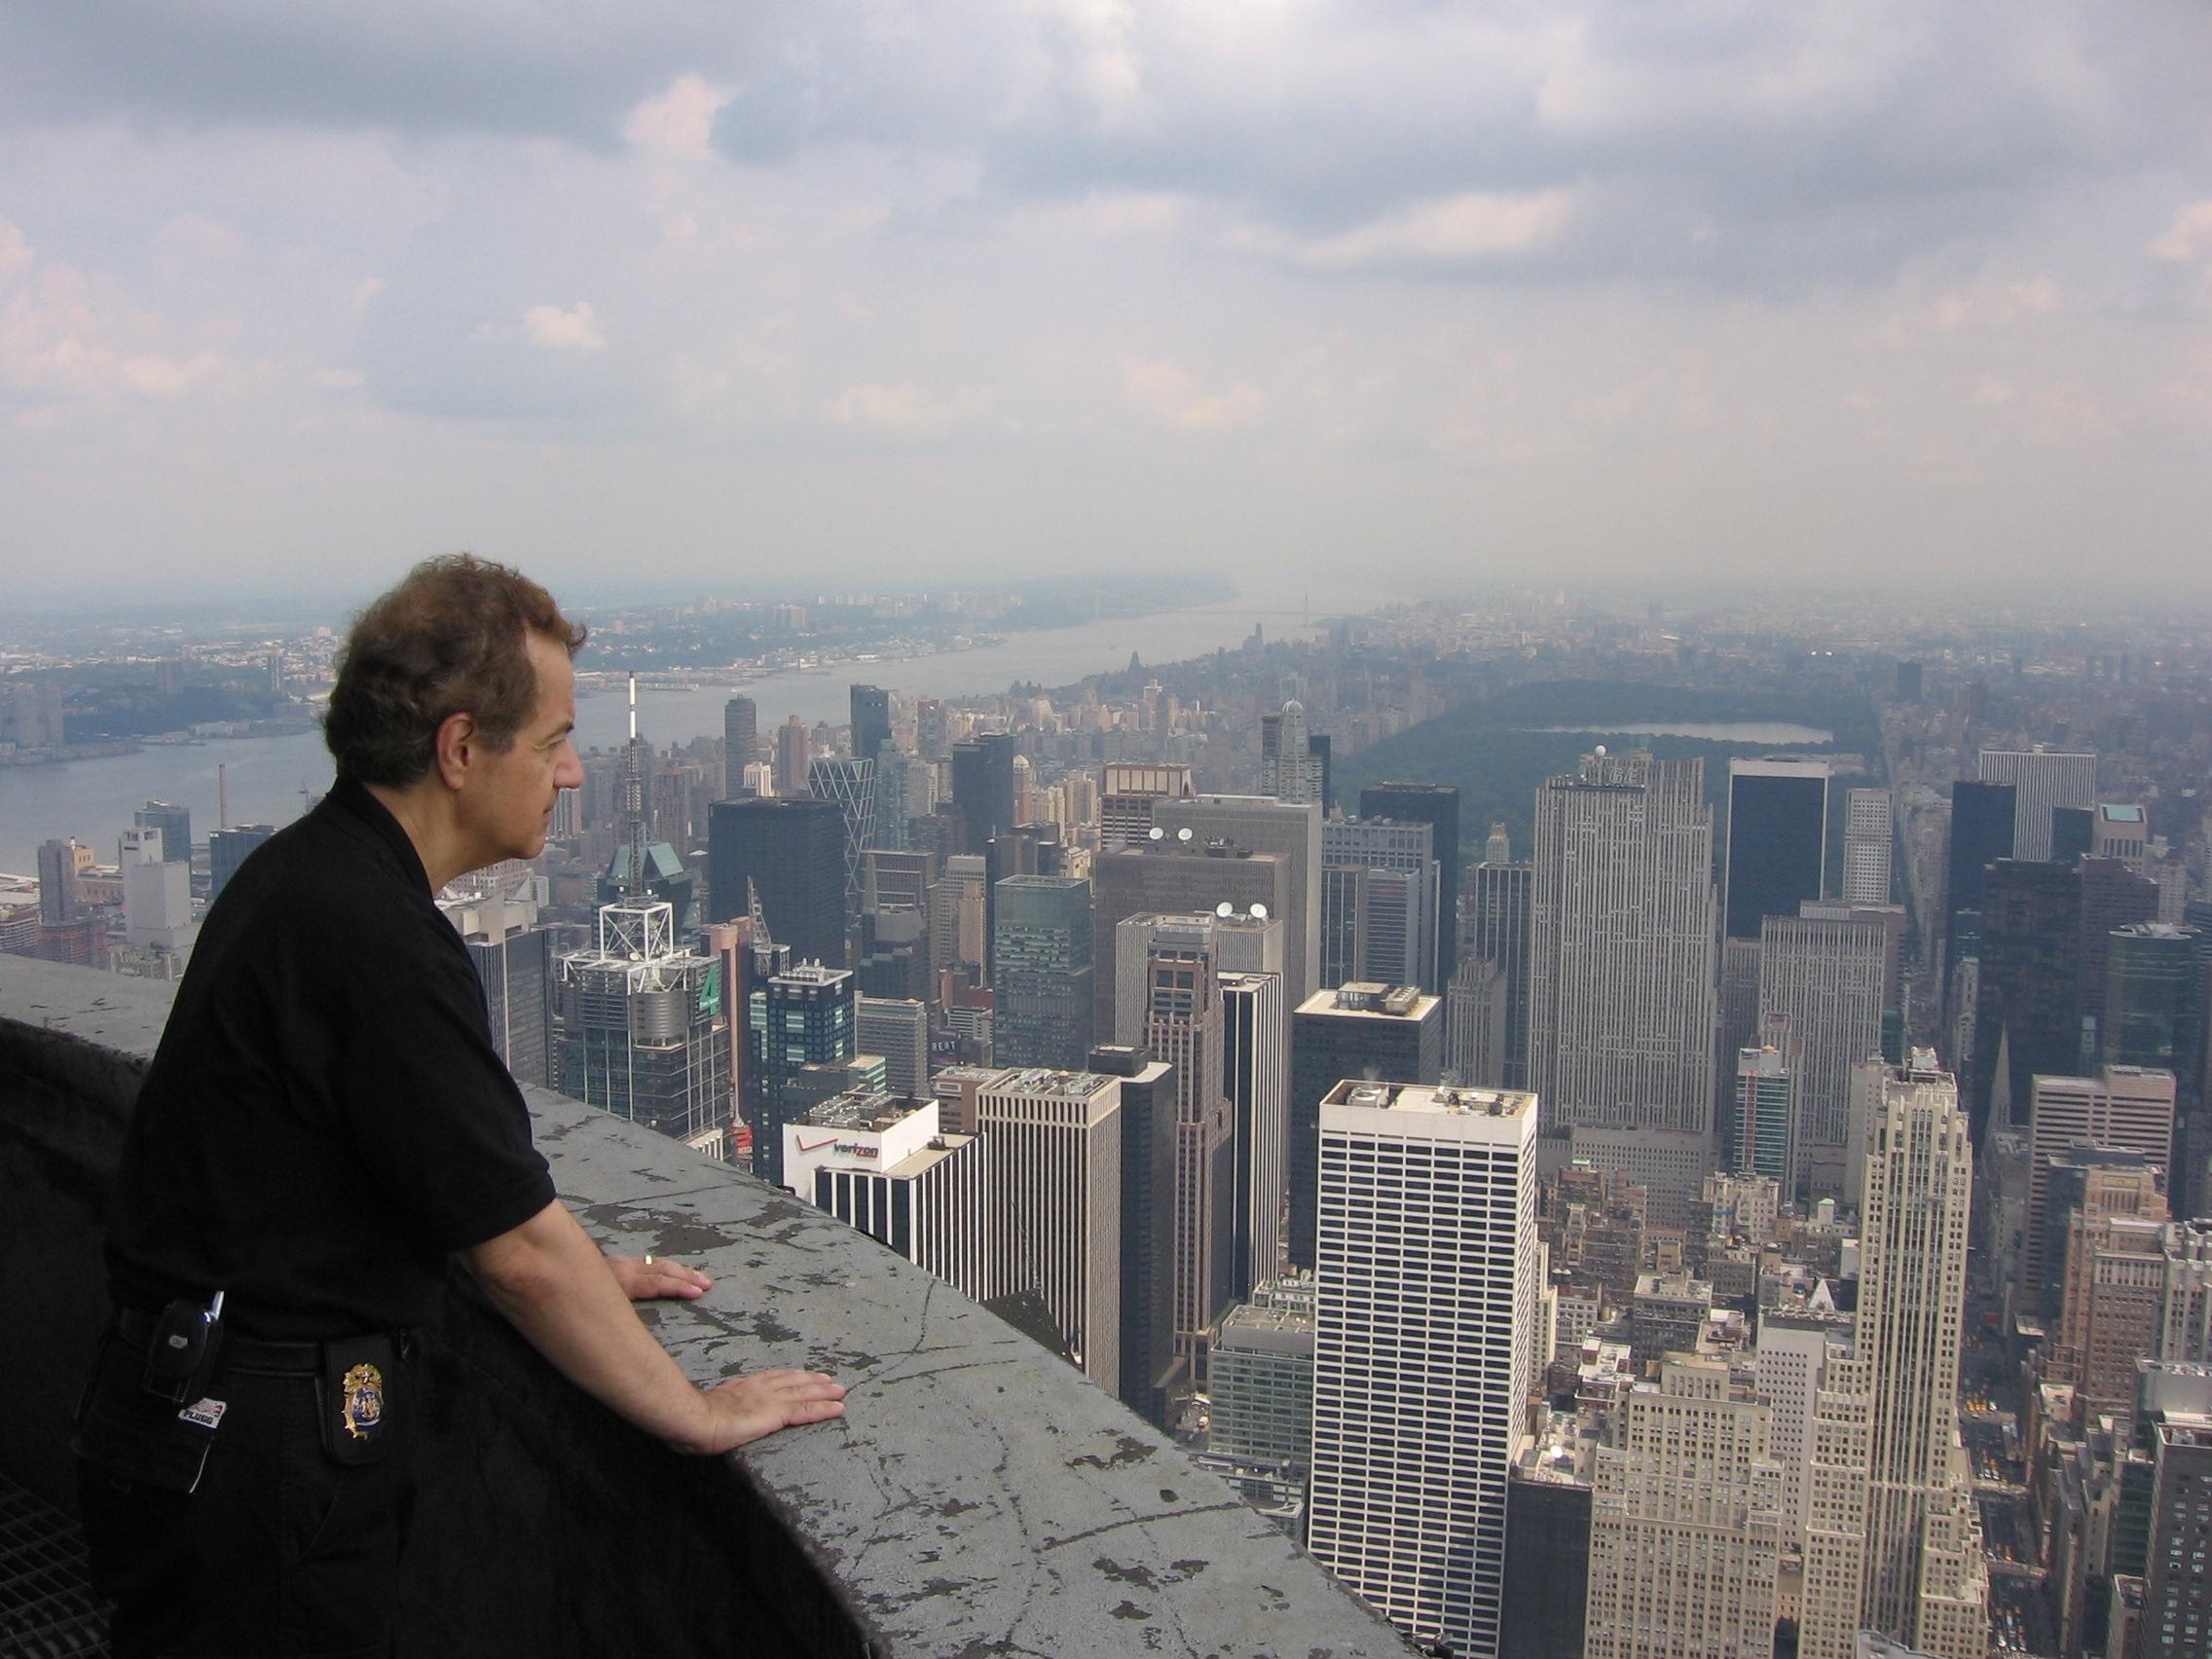 Empire State Building Donut 01 - Under the Spire.jpg